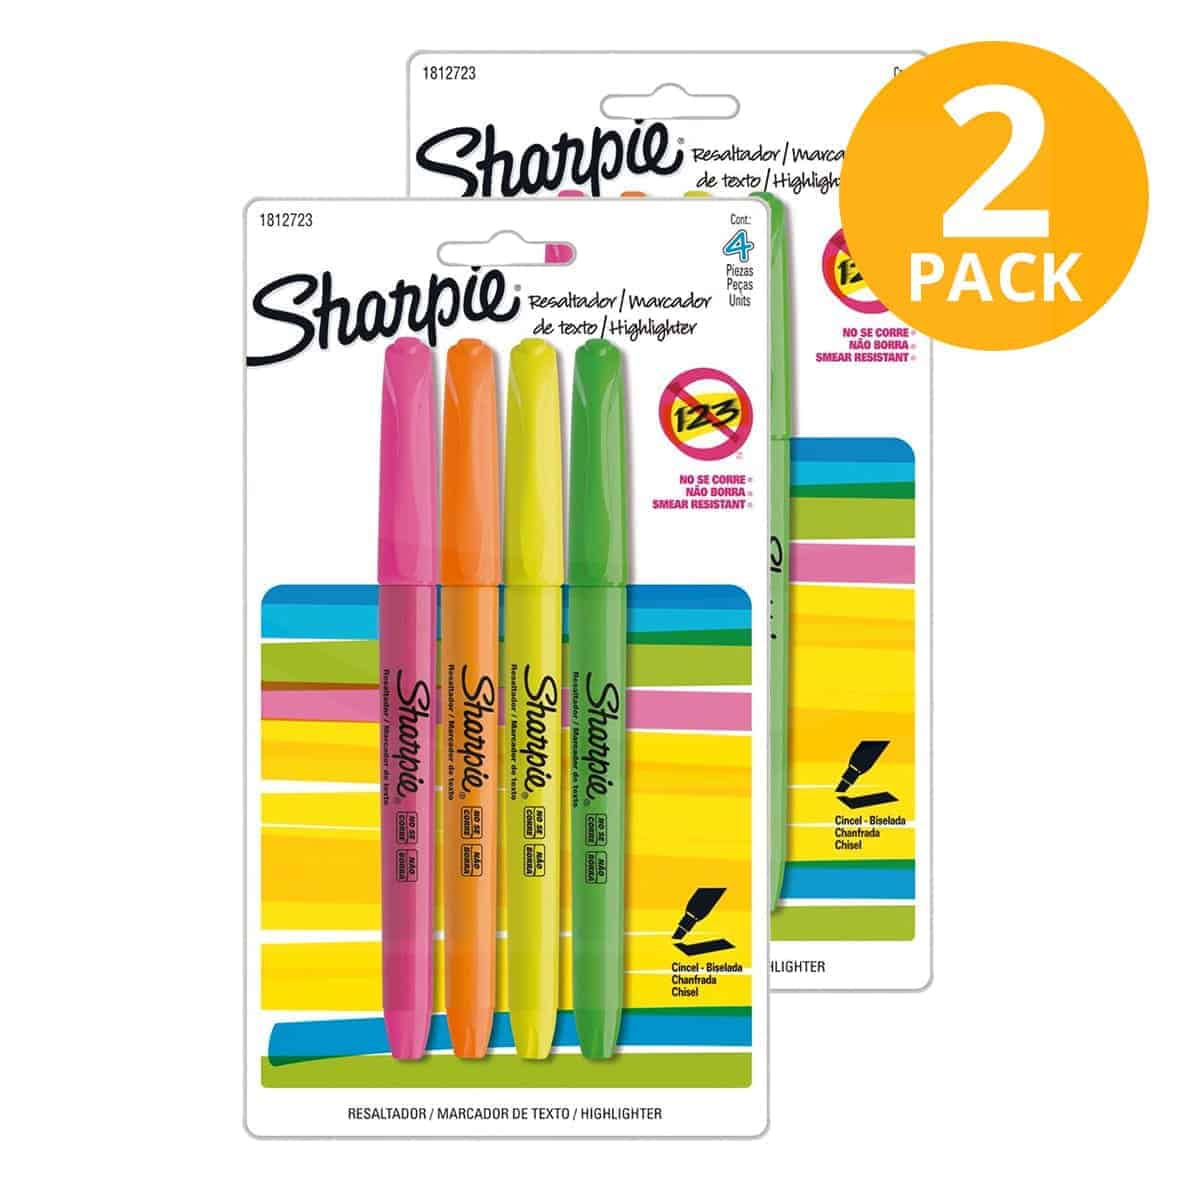 Sharpie, 8 Resaltadores Delgados (Pack de 2 x 4)